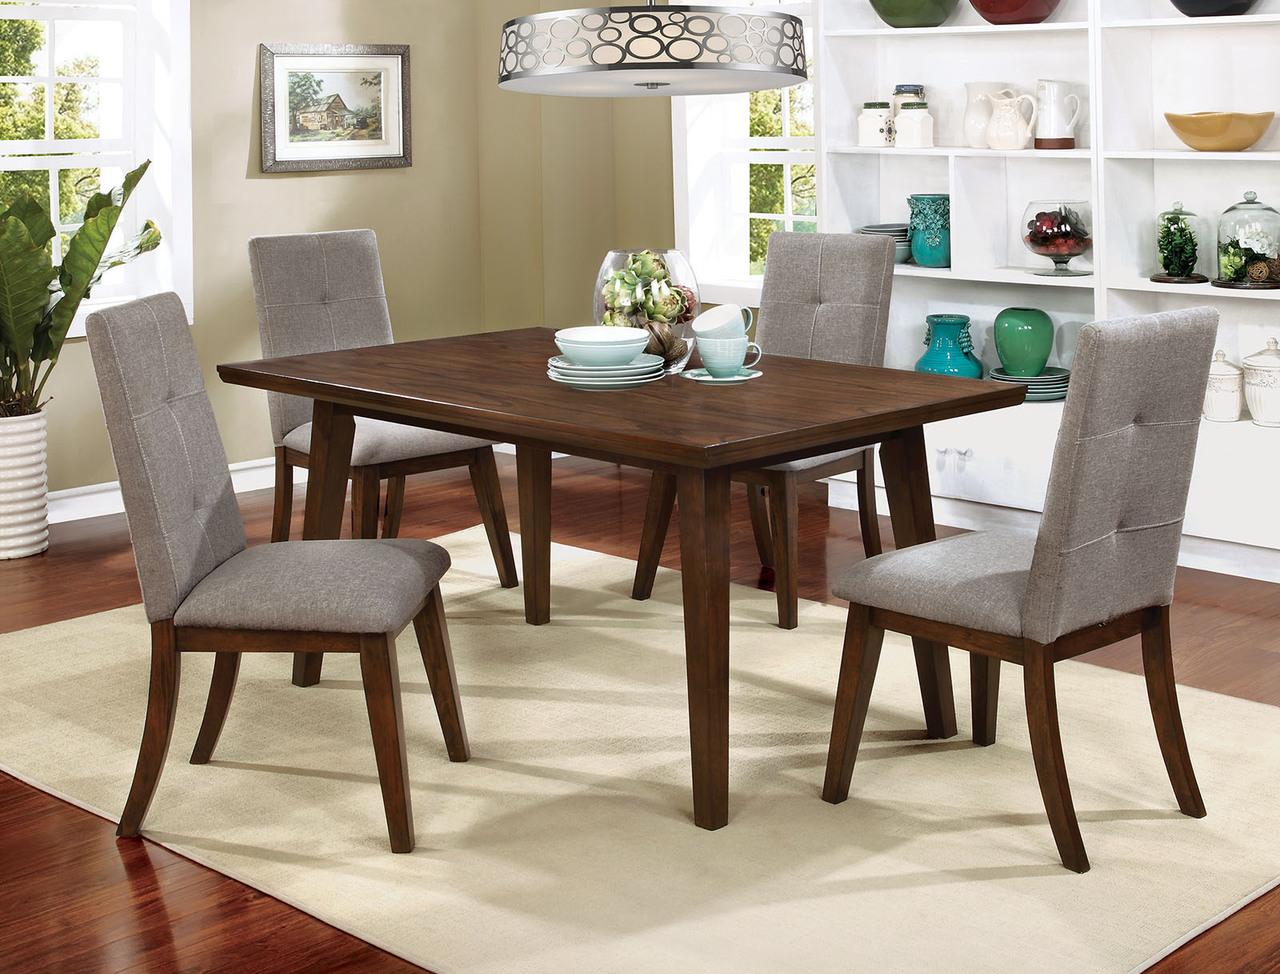 Furniture of America Walnut Dining Table Set